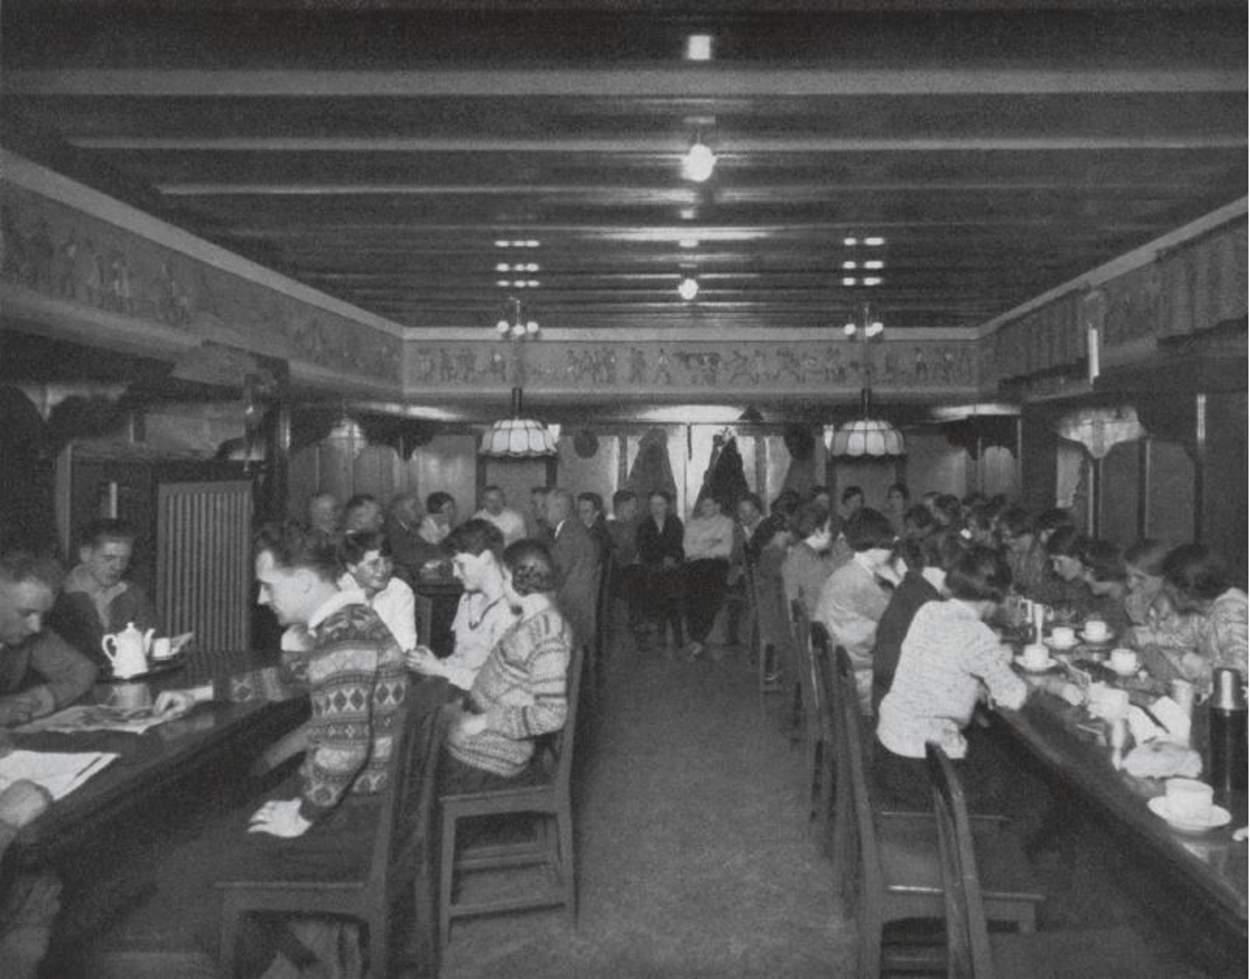 Salle à manger dans l'auberge de jeunesse Neu-Astenberg, Sauerland